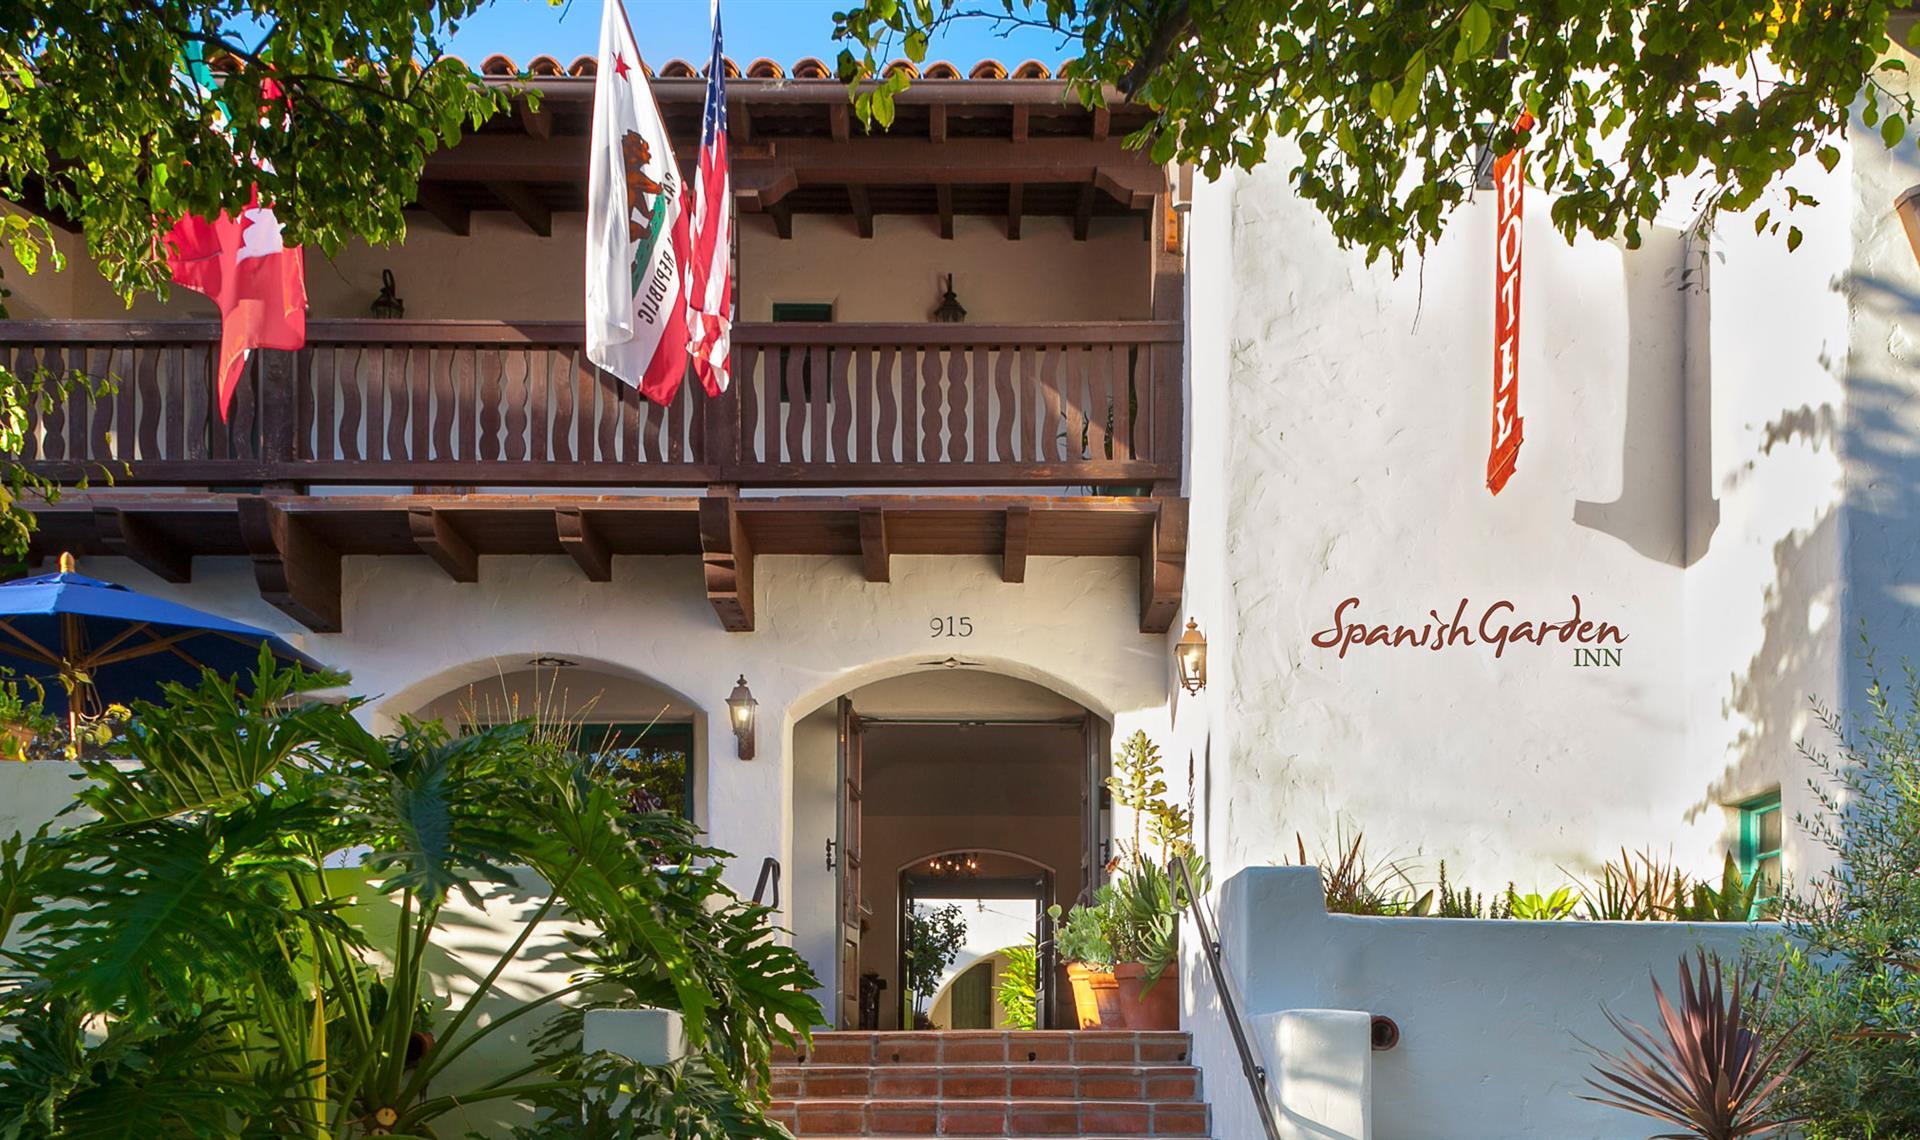 Exterior entrance to Spanish Garden Inn in Santa Barbara